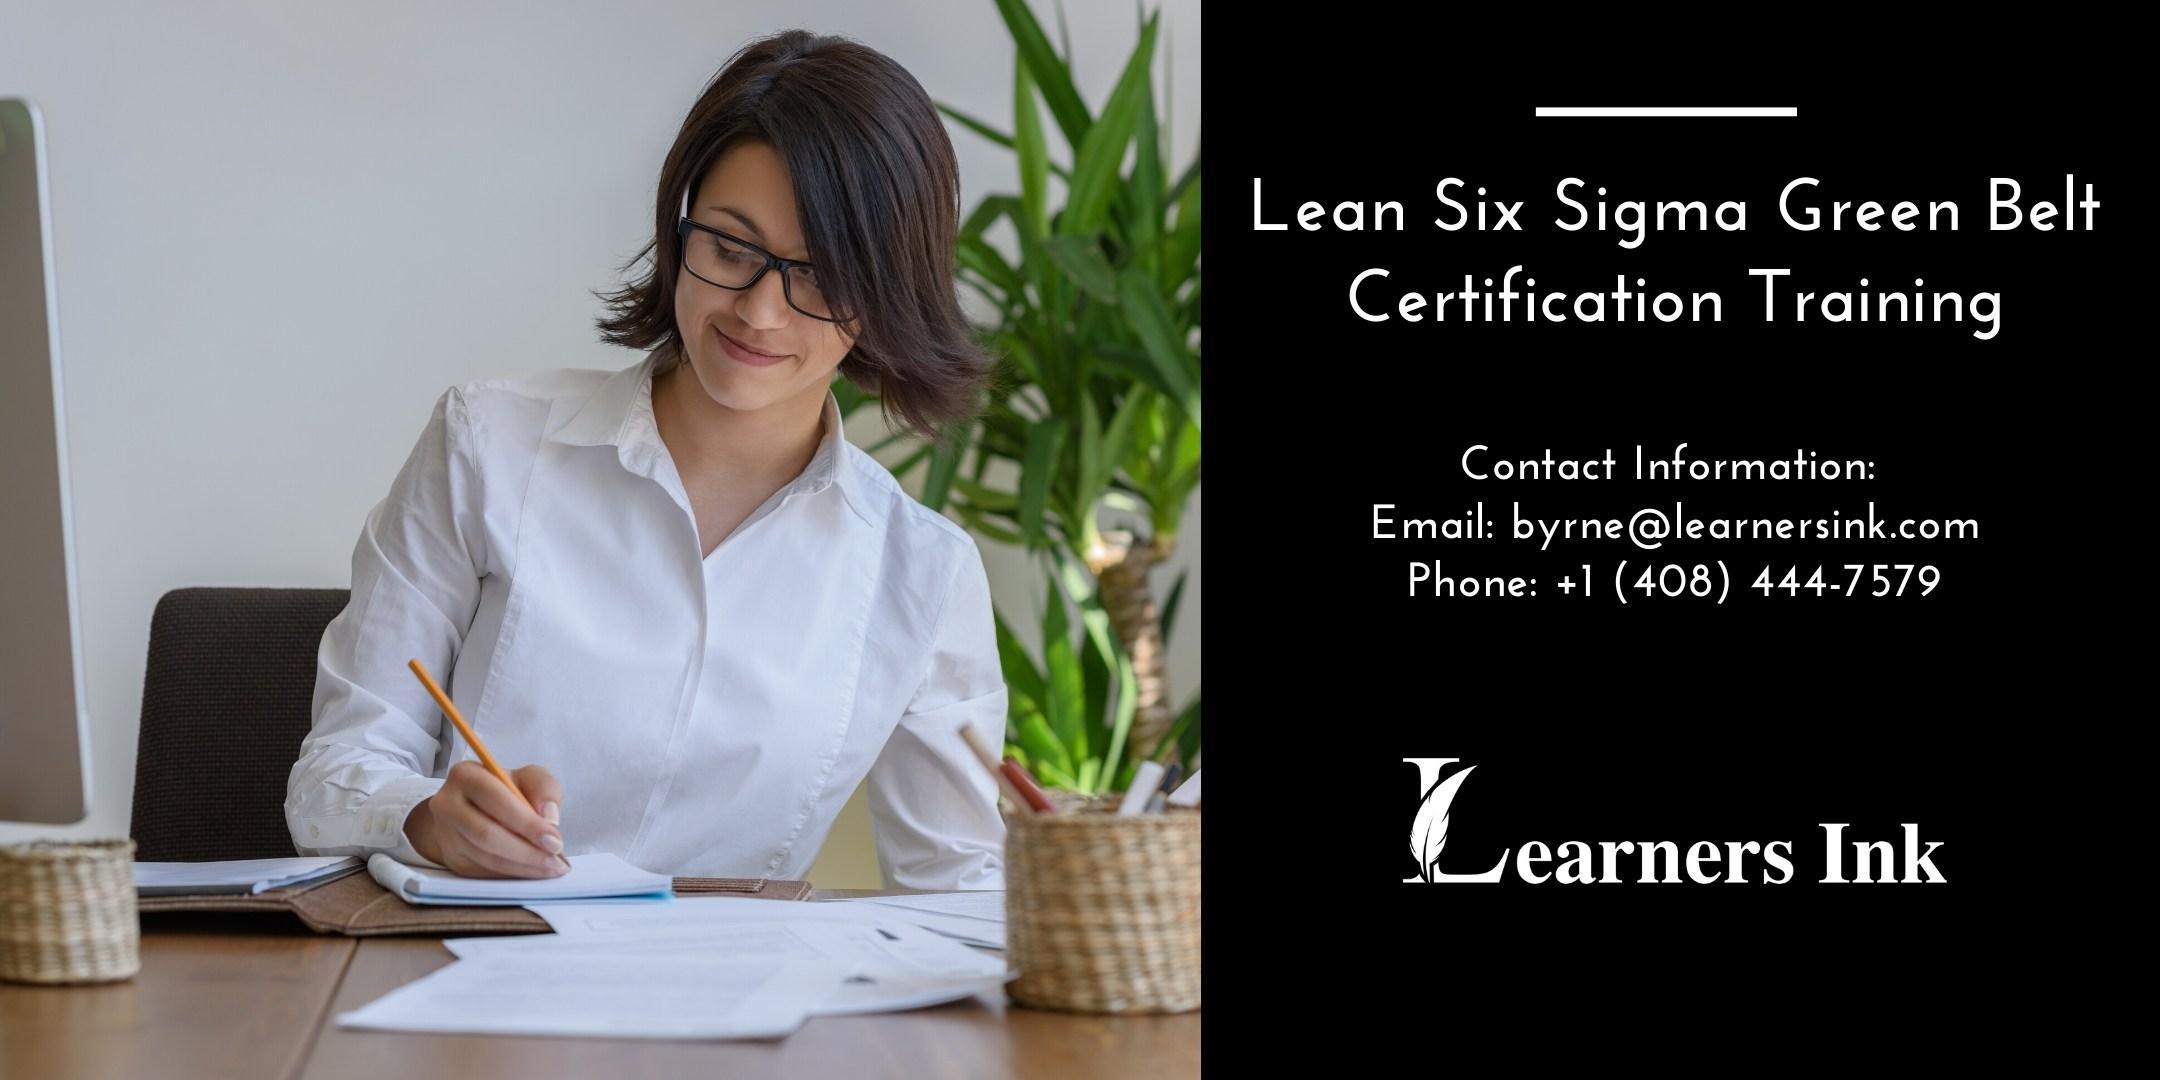 Lean Six Sigma Green Belt Certification Training Course (LSSGB) in Winnipeg